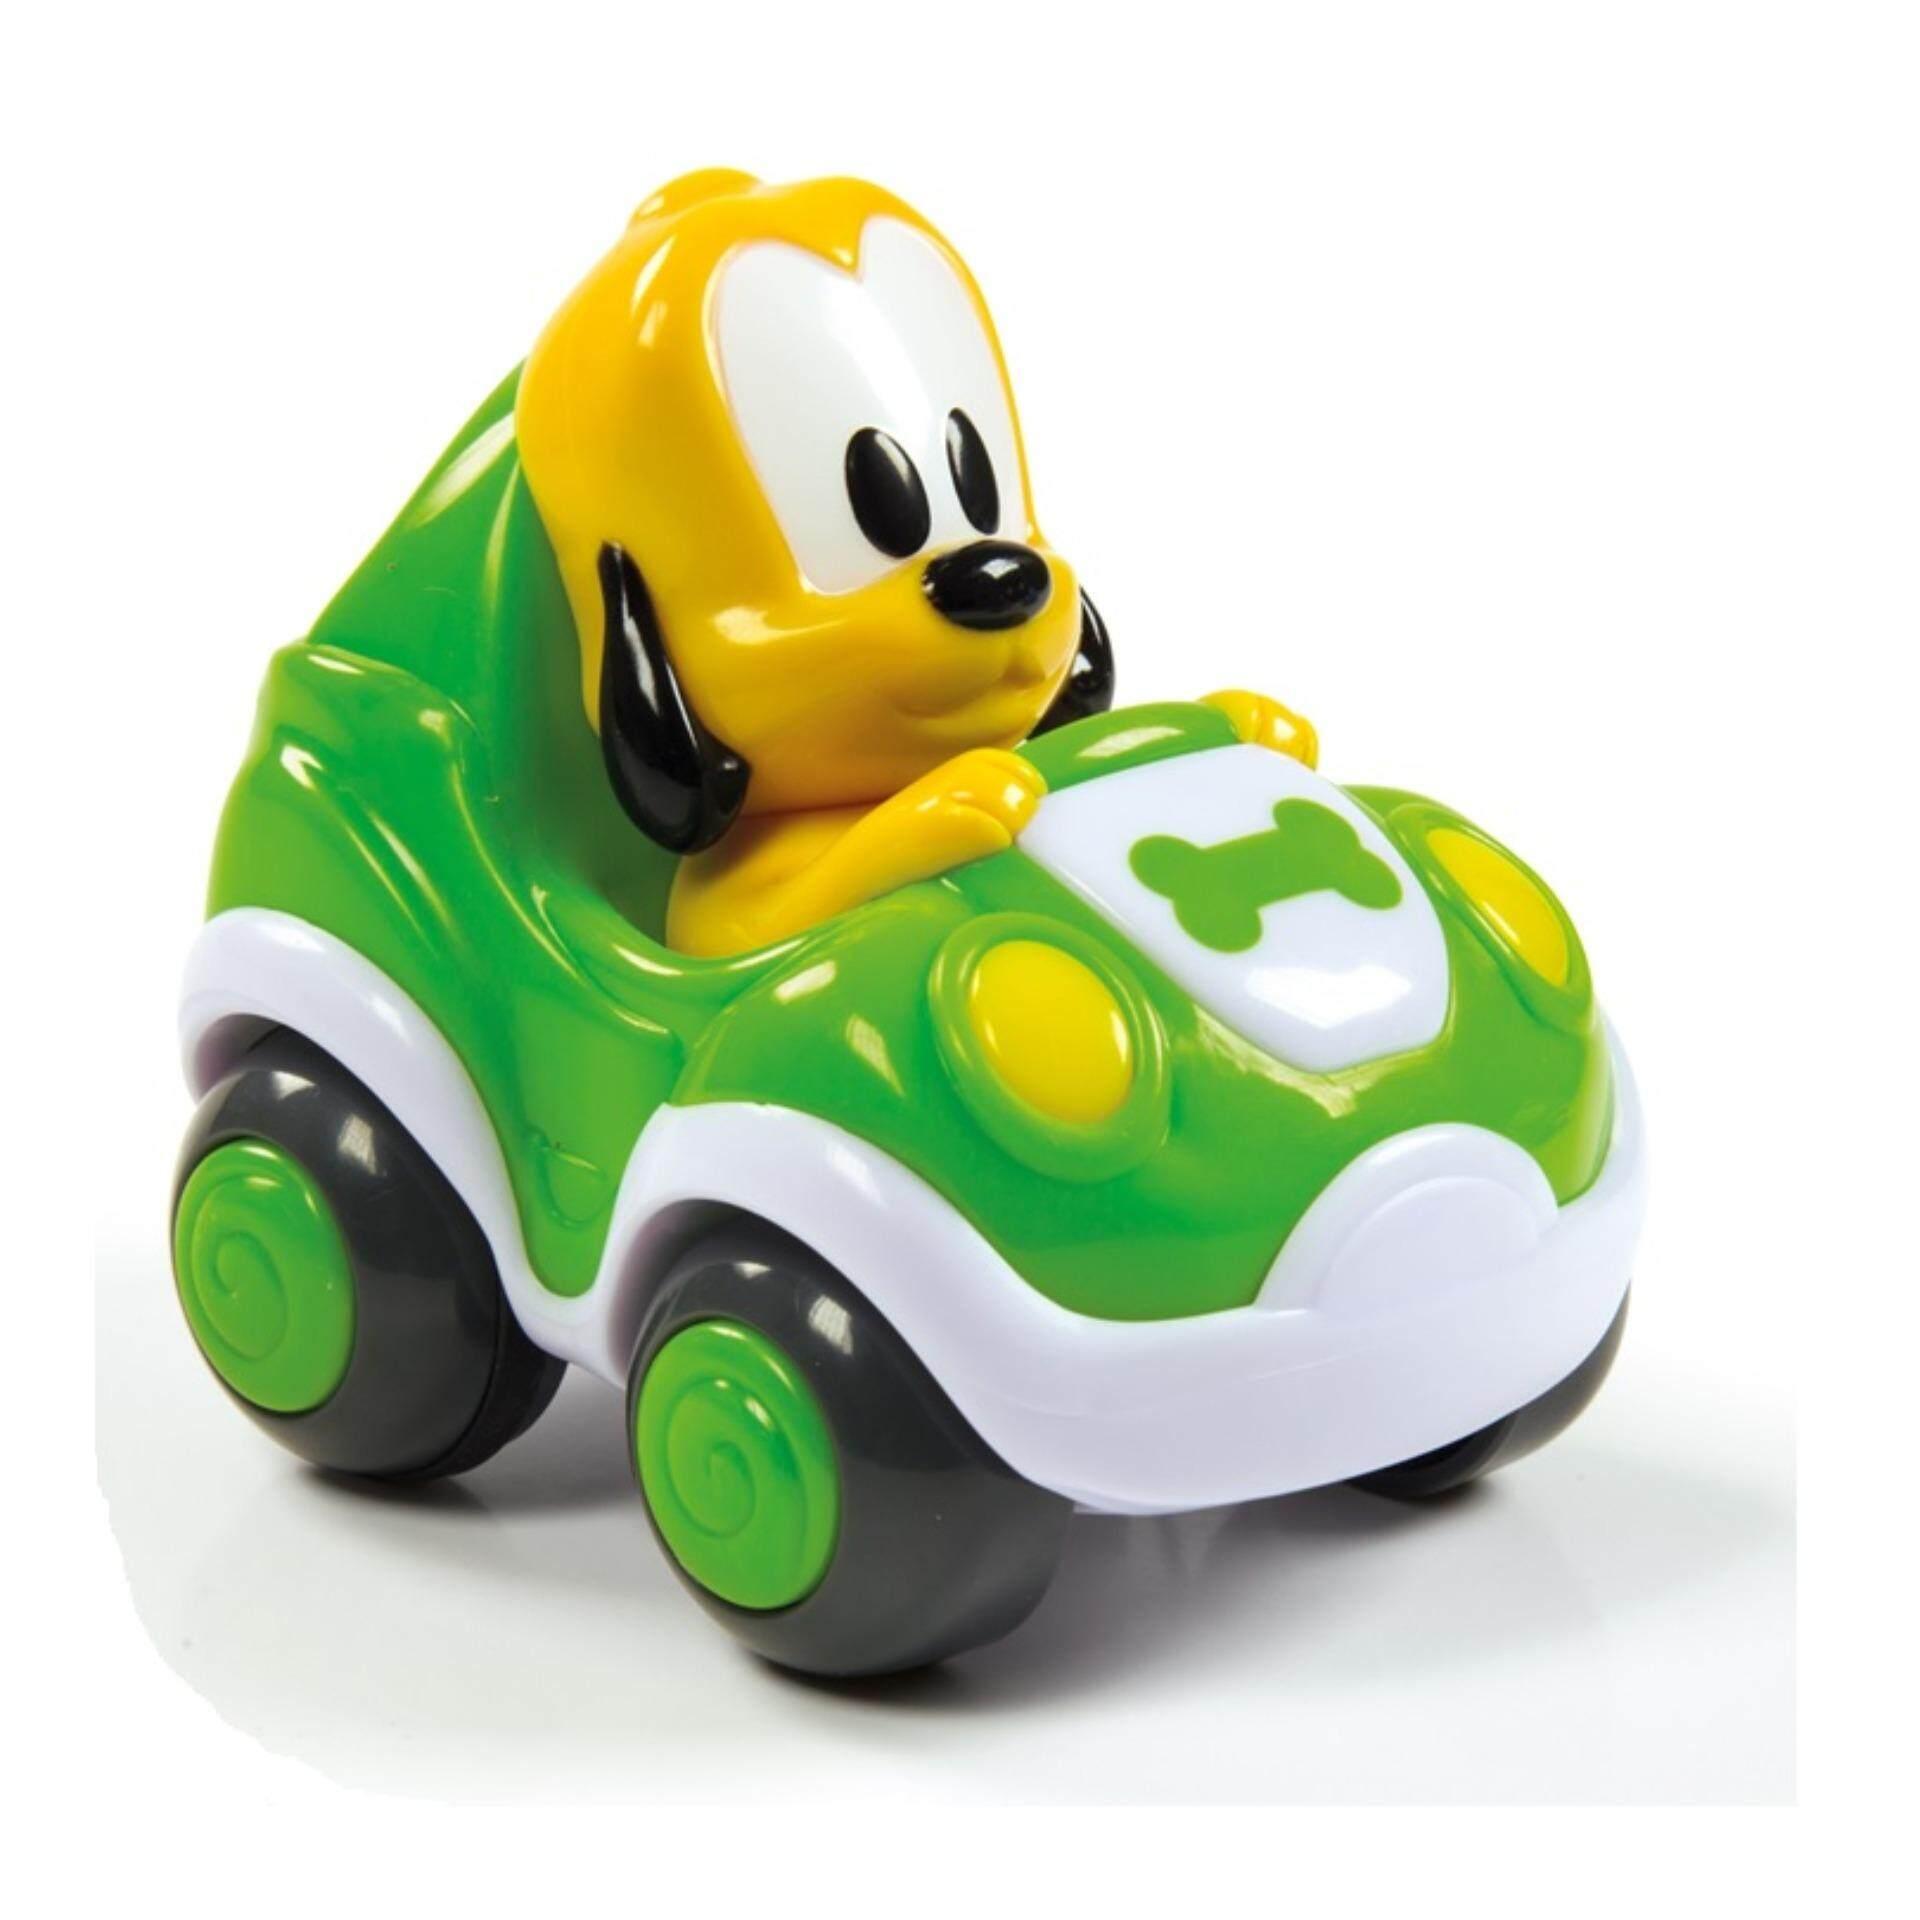 Disney Baby Pull Back Cars Toys - Pluto baby toys